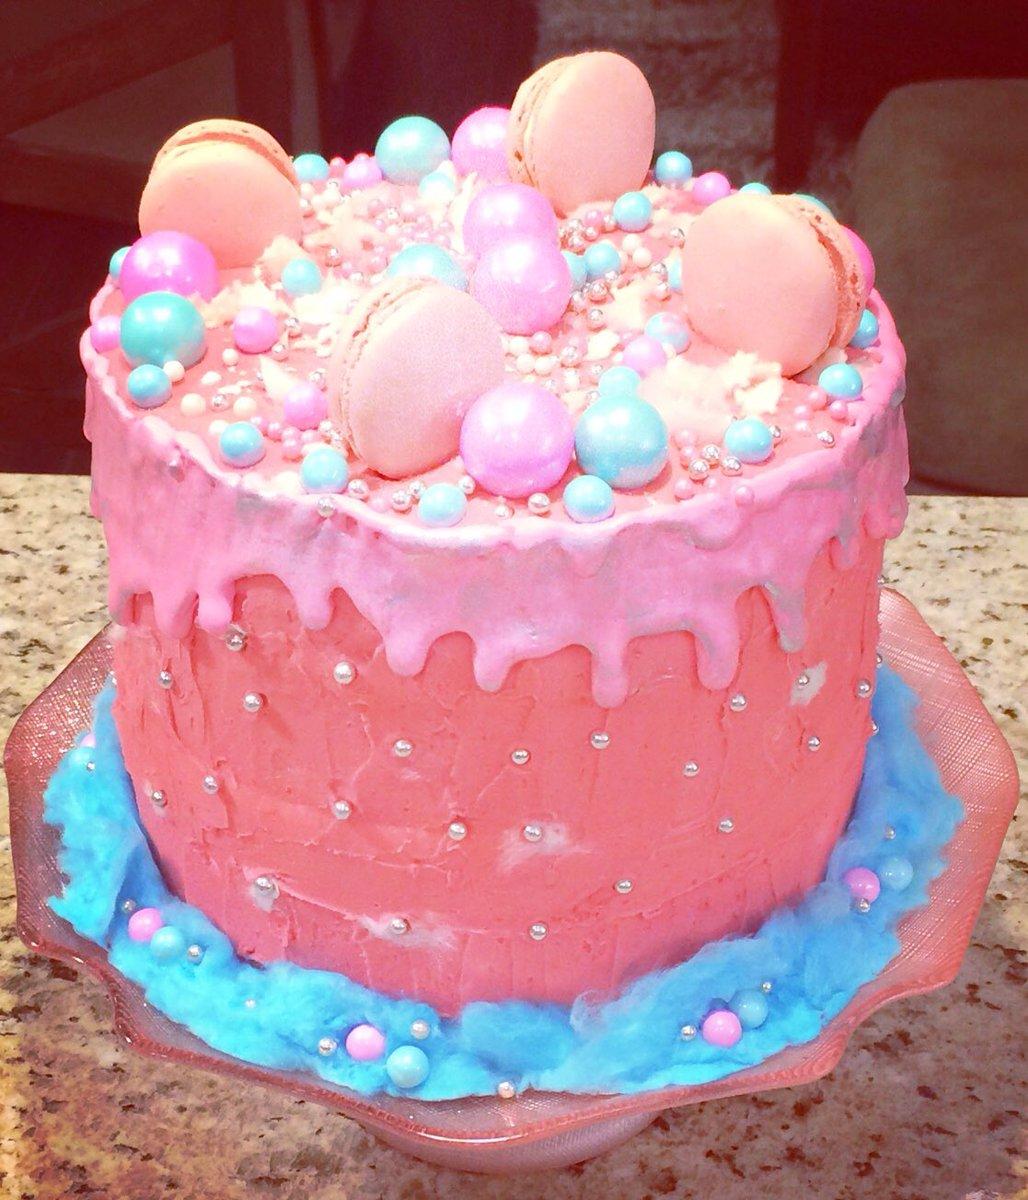 Terrific Allisbakery On Twitter A Pink In Blue Cotton Candy Cake Cake Funny Birthday Cards Online Hendilapandamsfinfo